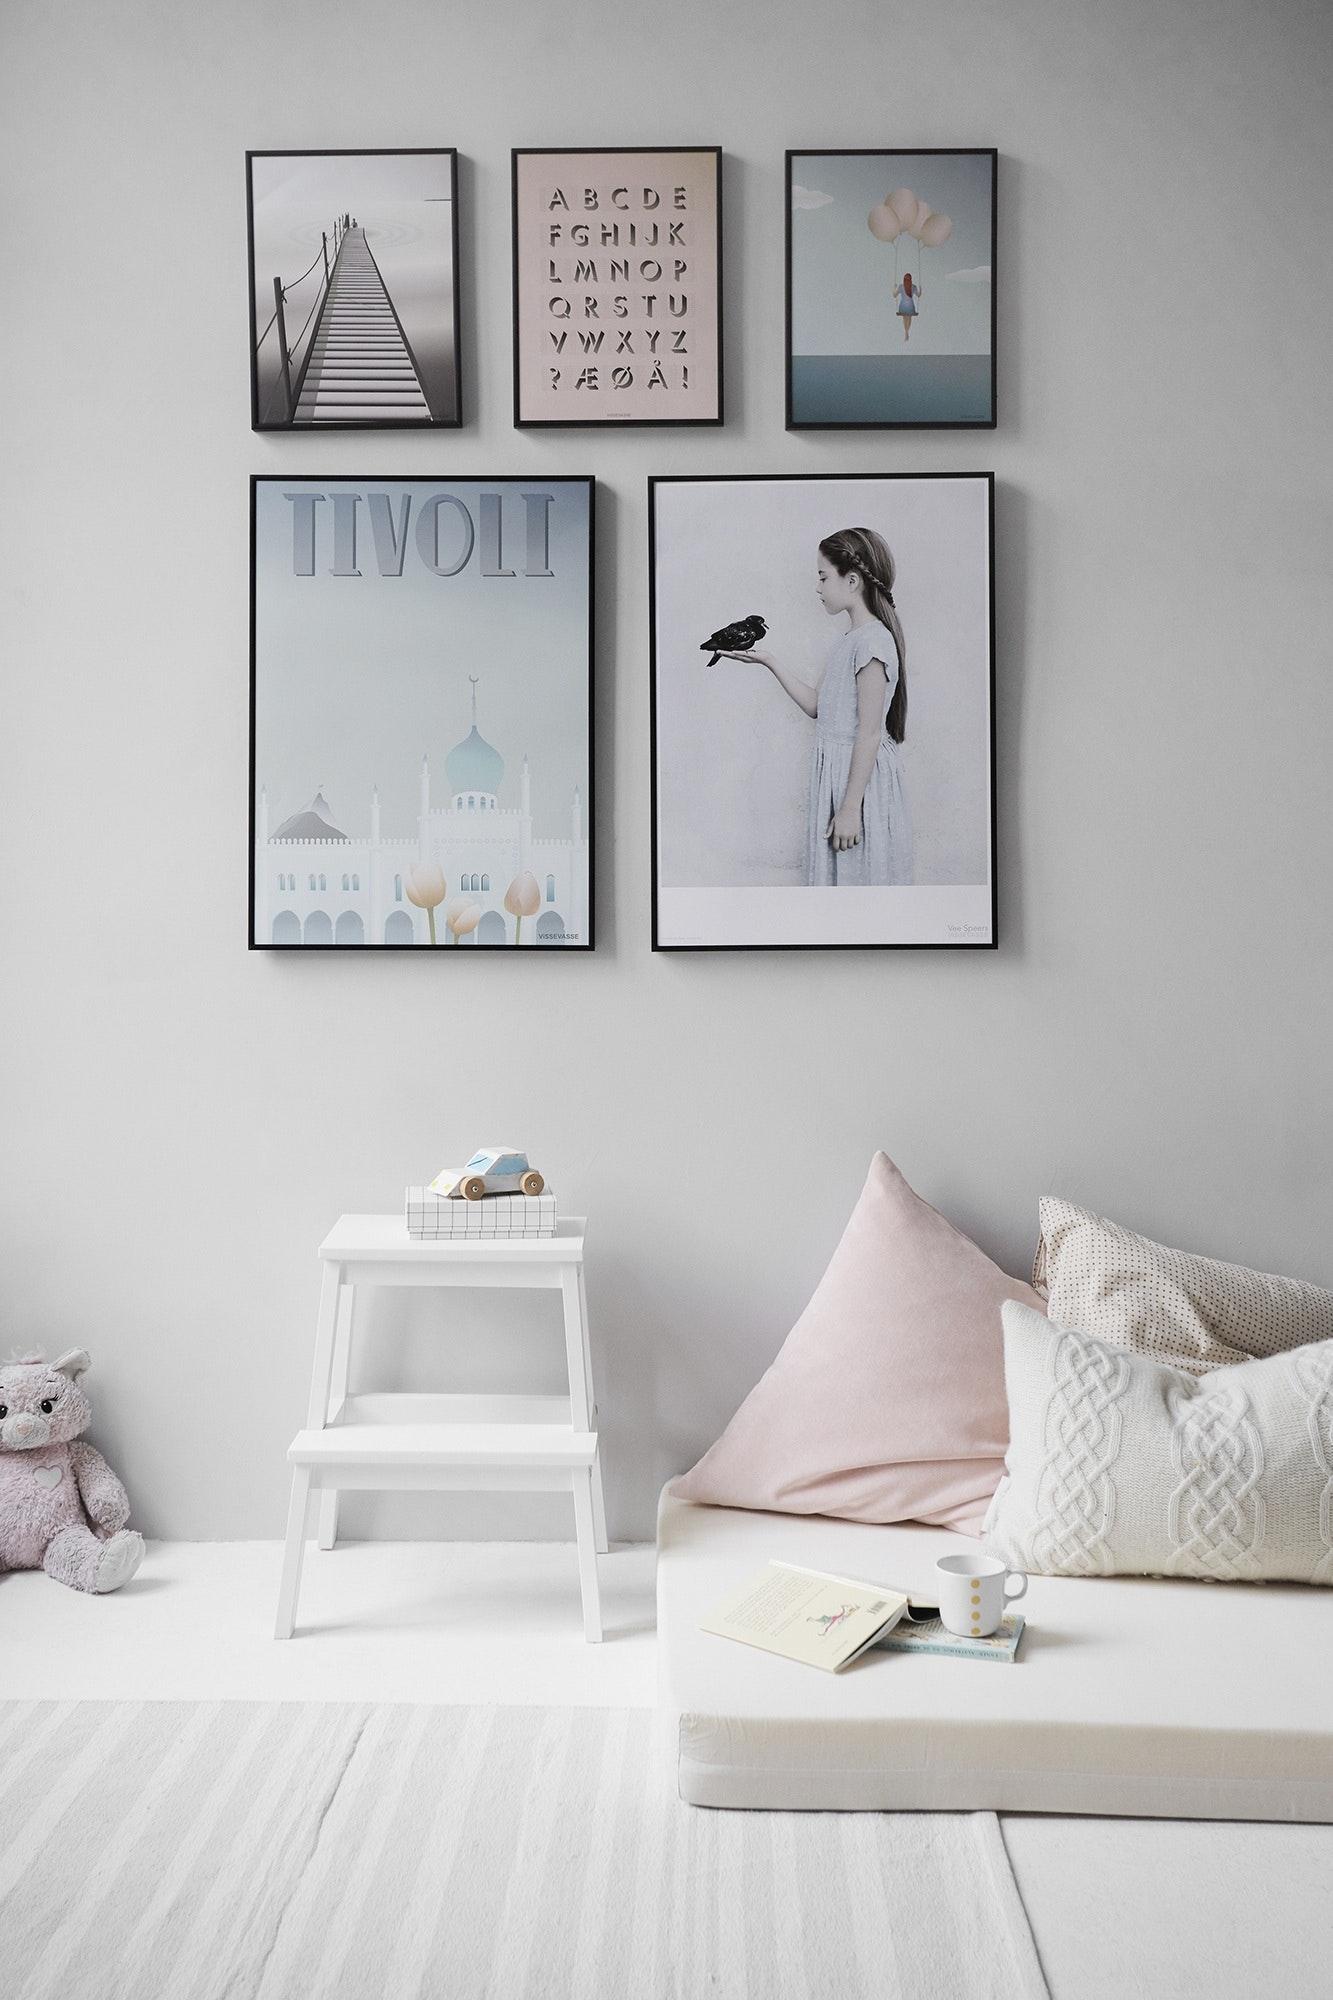 zapkey home décor hacks